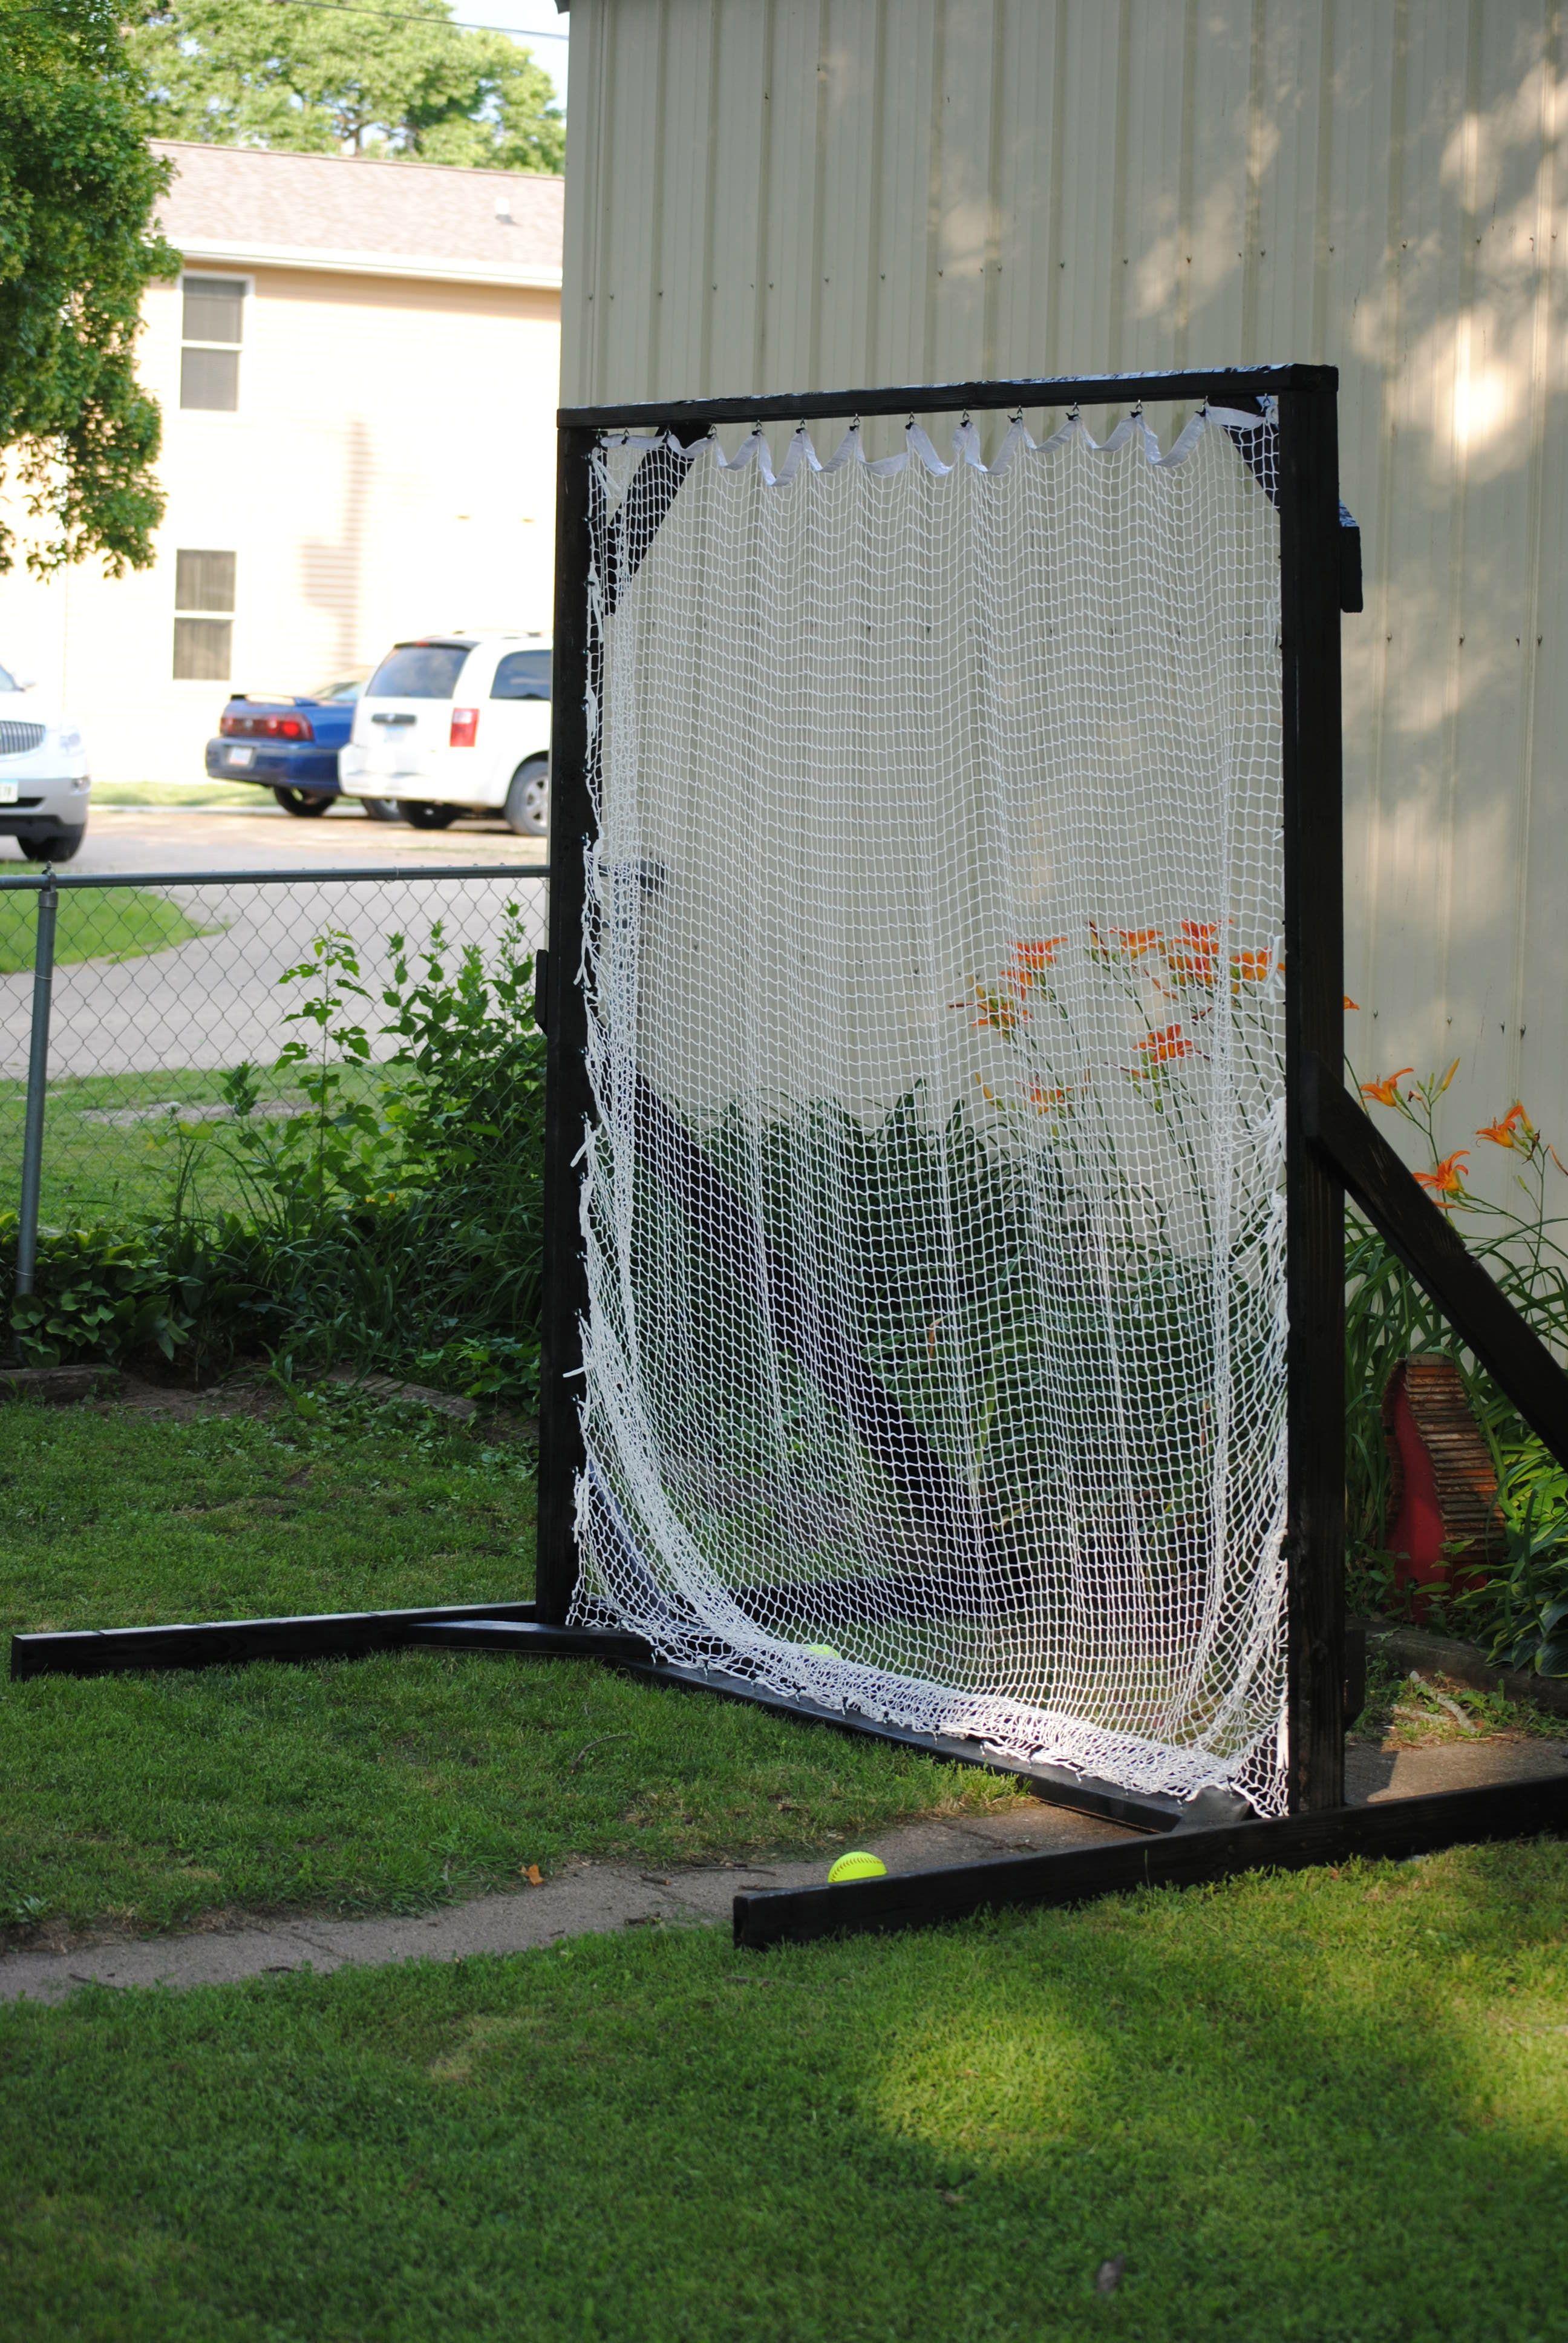 softball/baseball net for hitting and learning to pitch. reynaldo